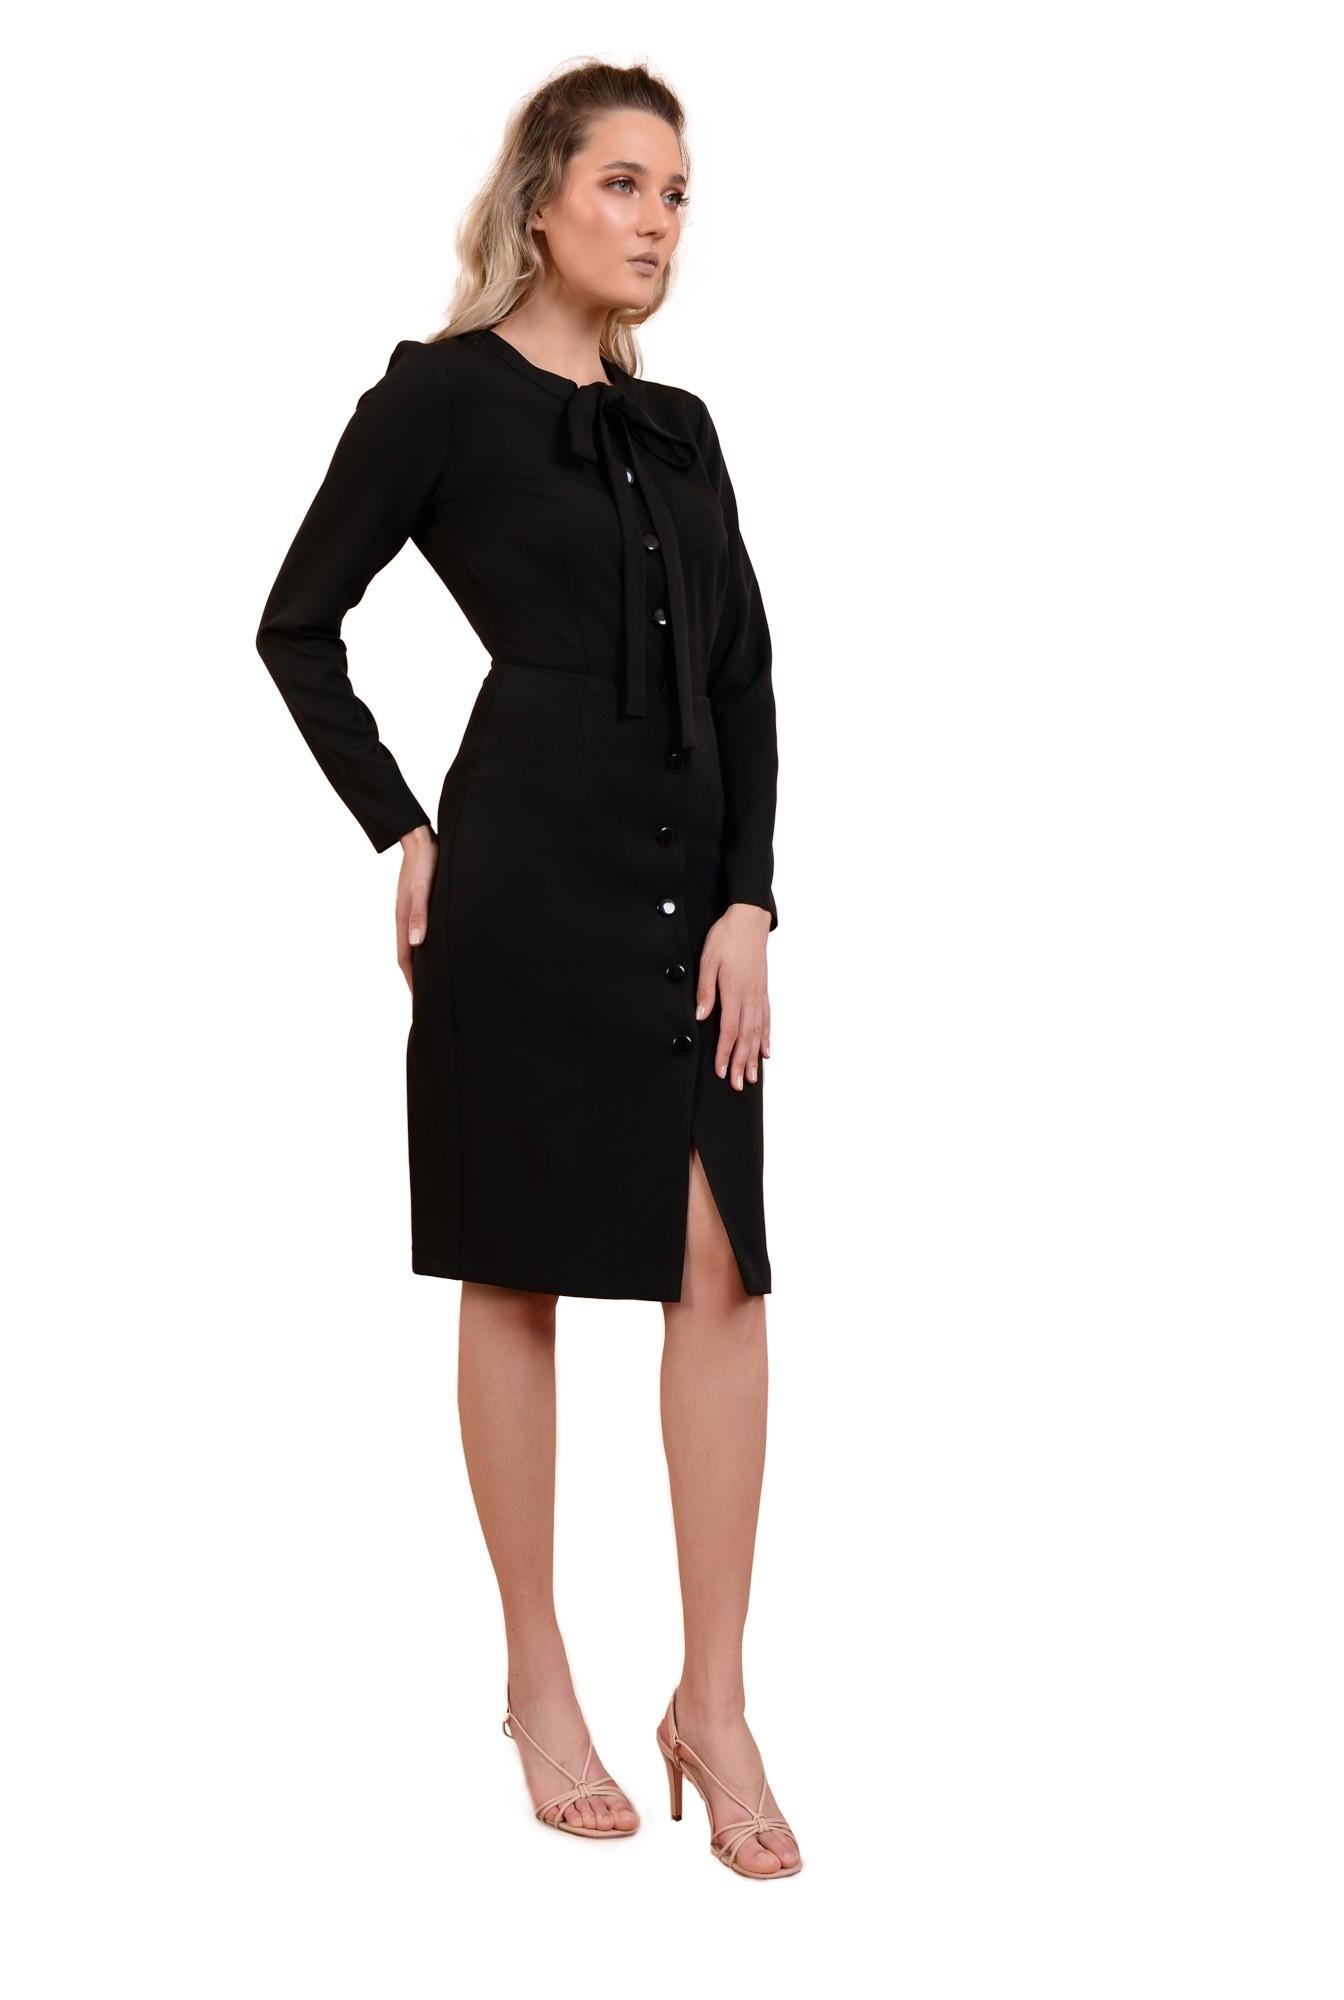 3 - 360 - rochie midi, ajustata, cu nasturi, maneci lungi, cu funda, Poema, negru